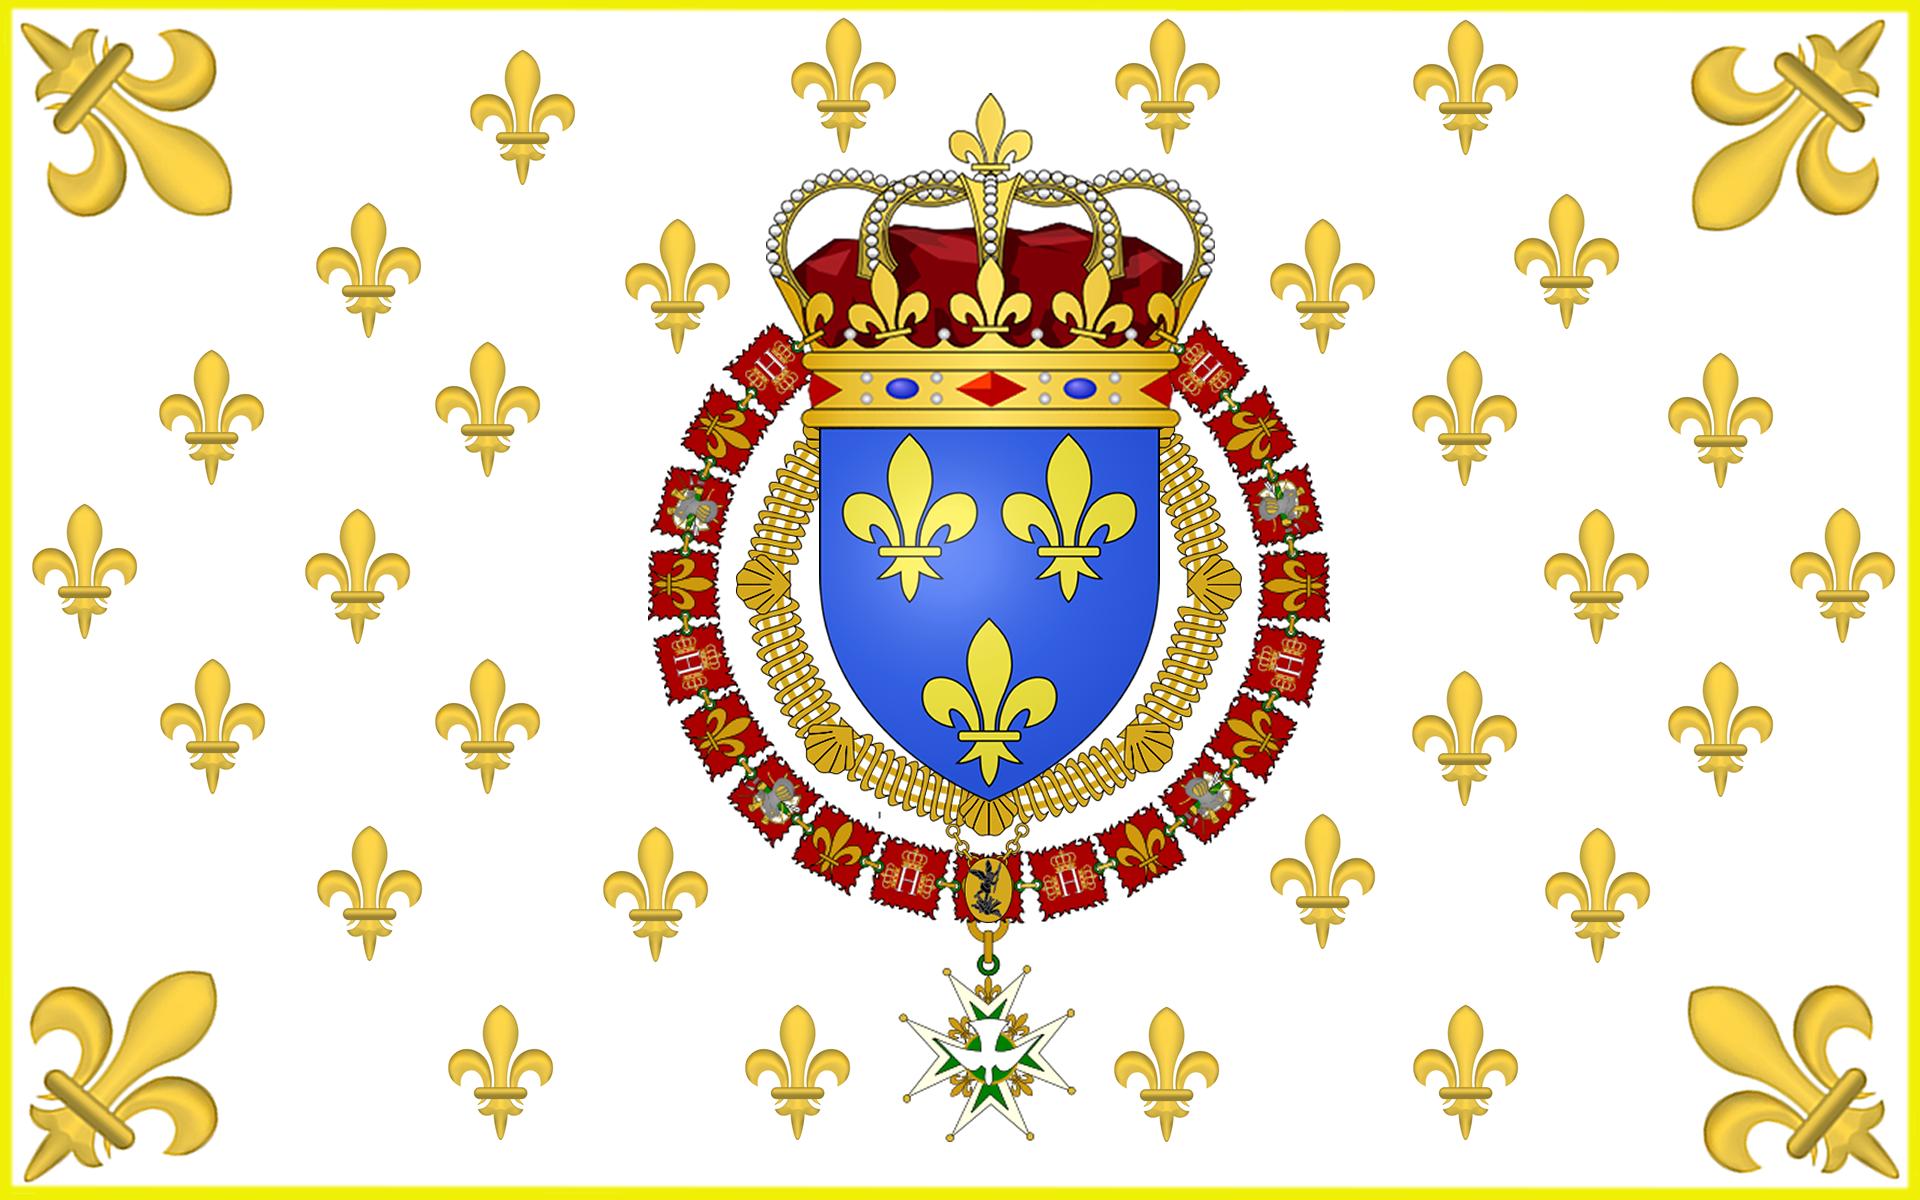 File:Drapeau royal1449.png - Wikimedia Commons